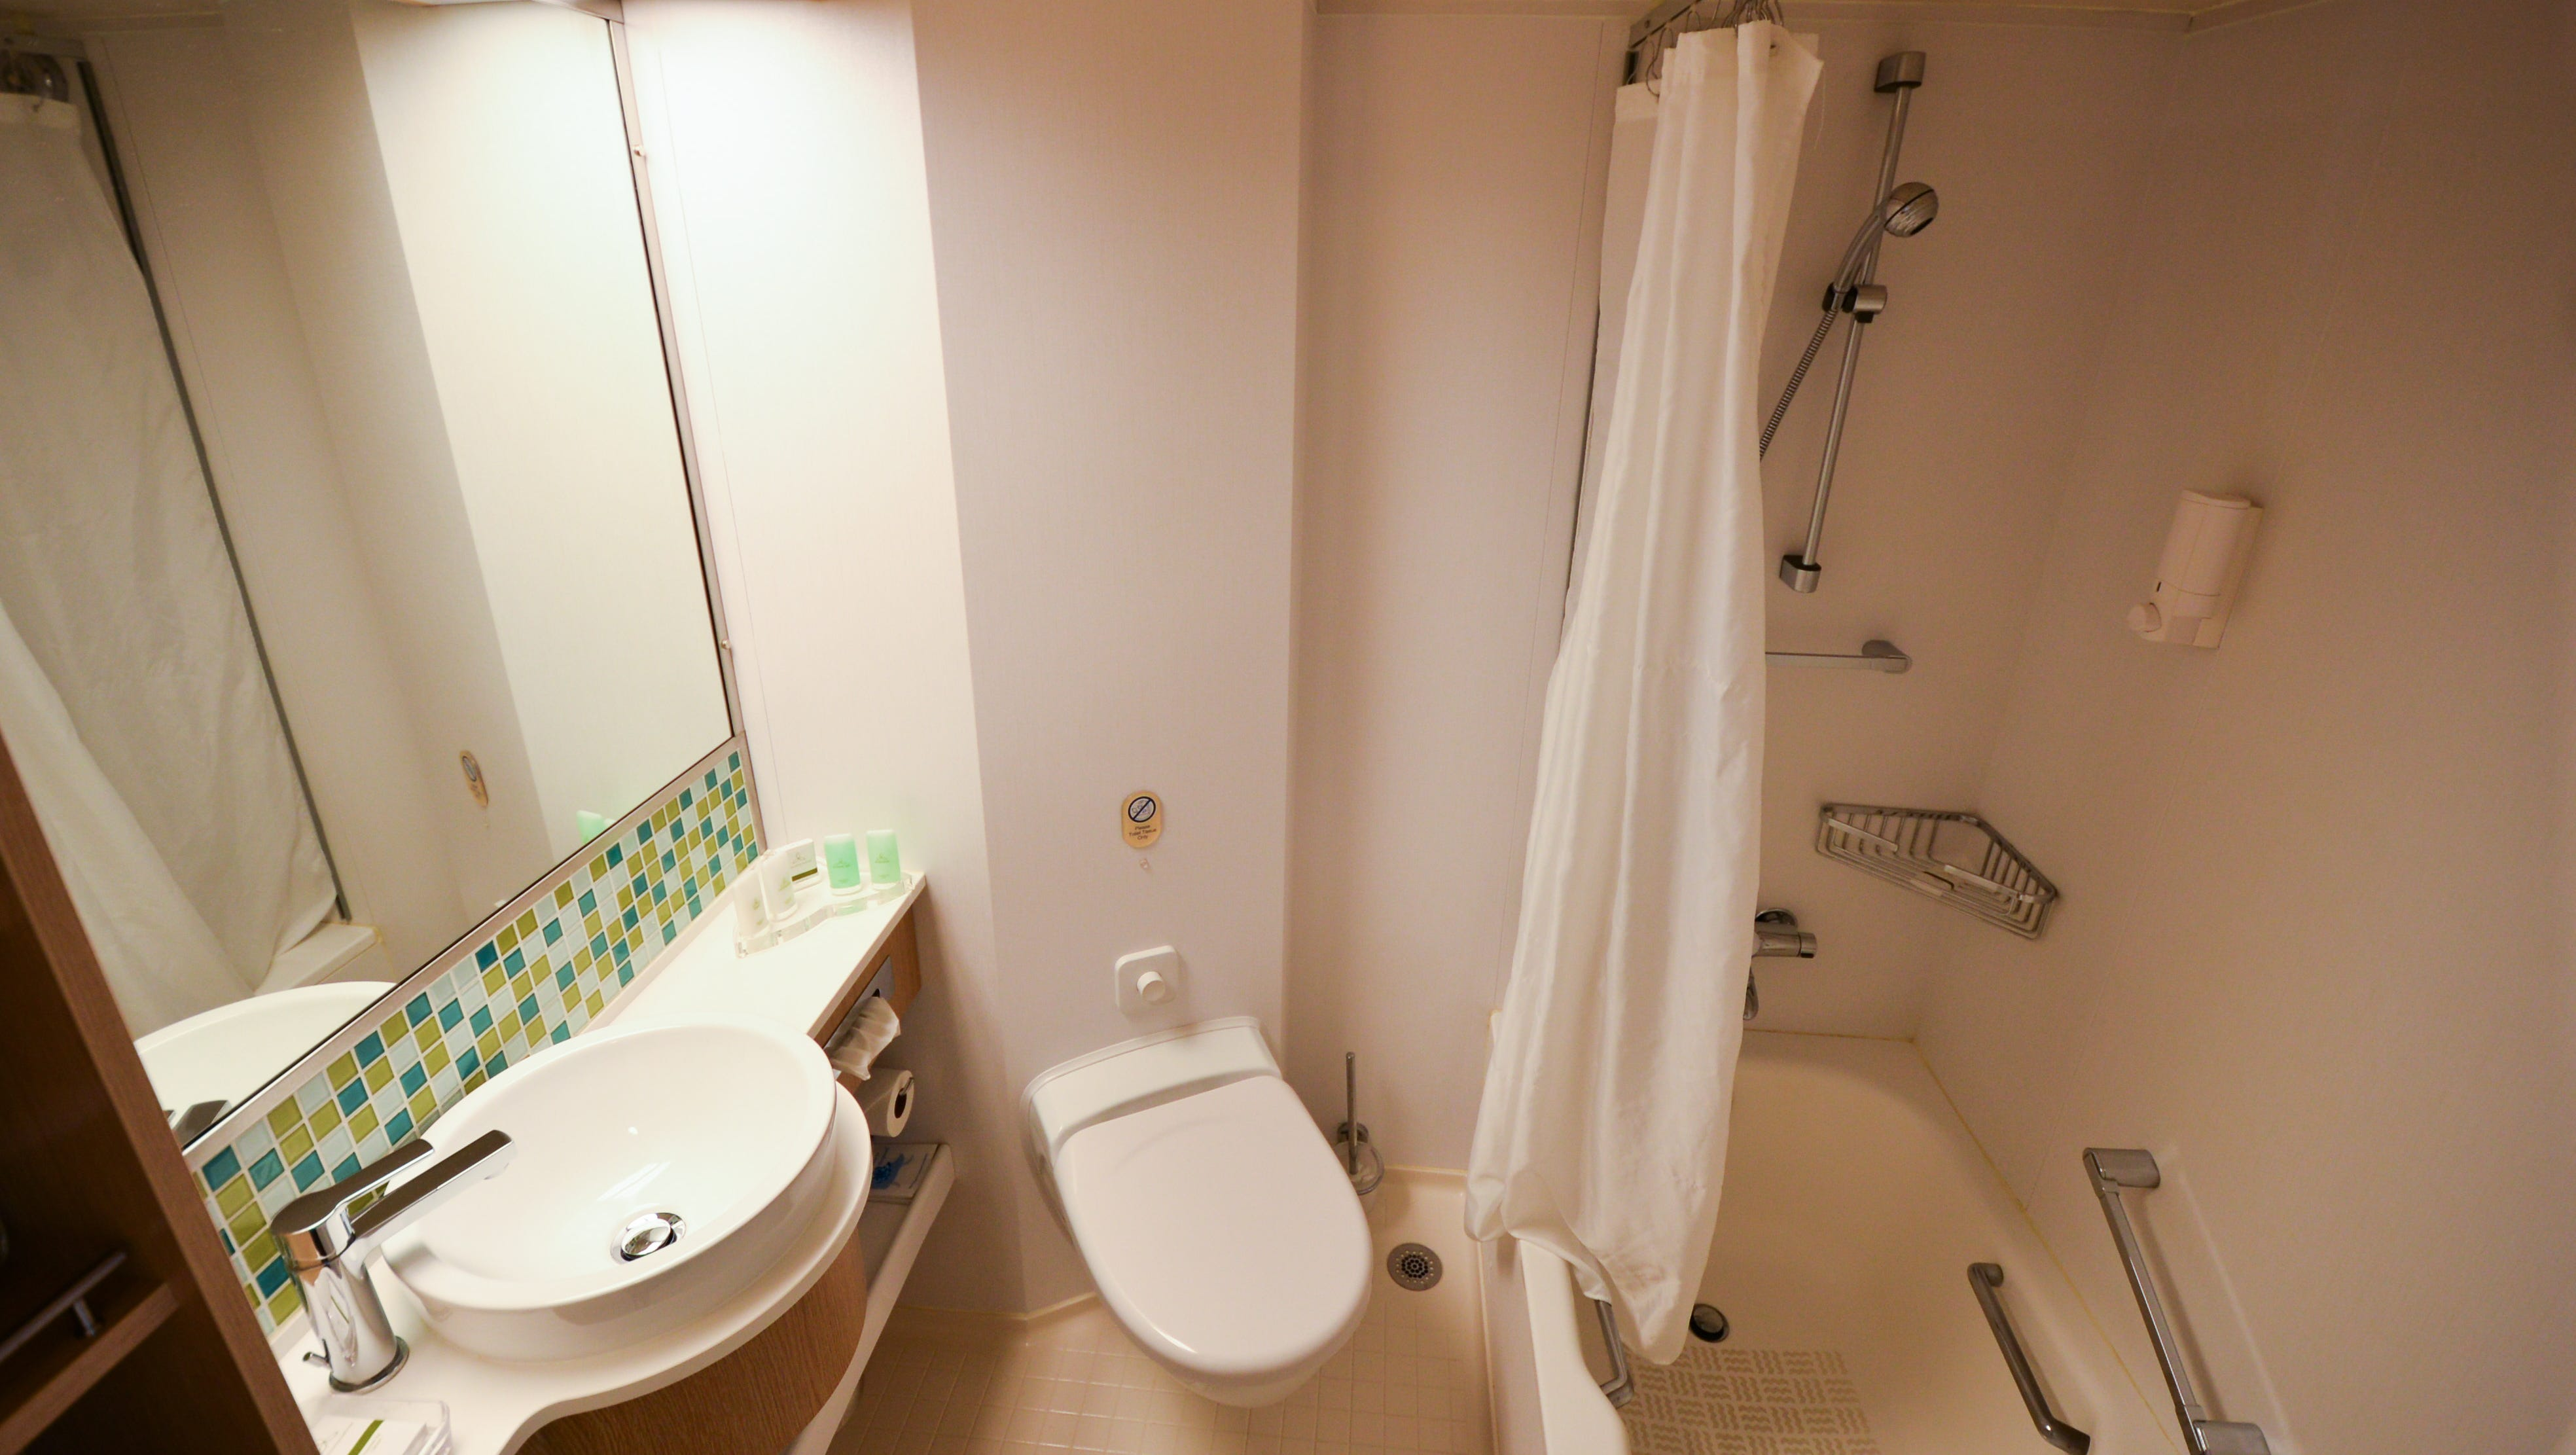 Junior suite bathrooms include bathtubs, which aren't found in standard Ocean View cabins.